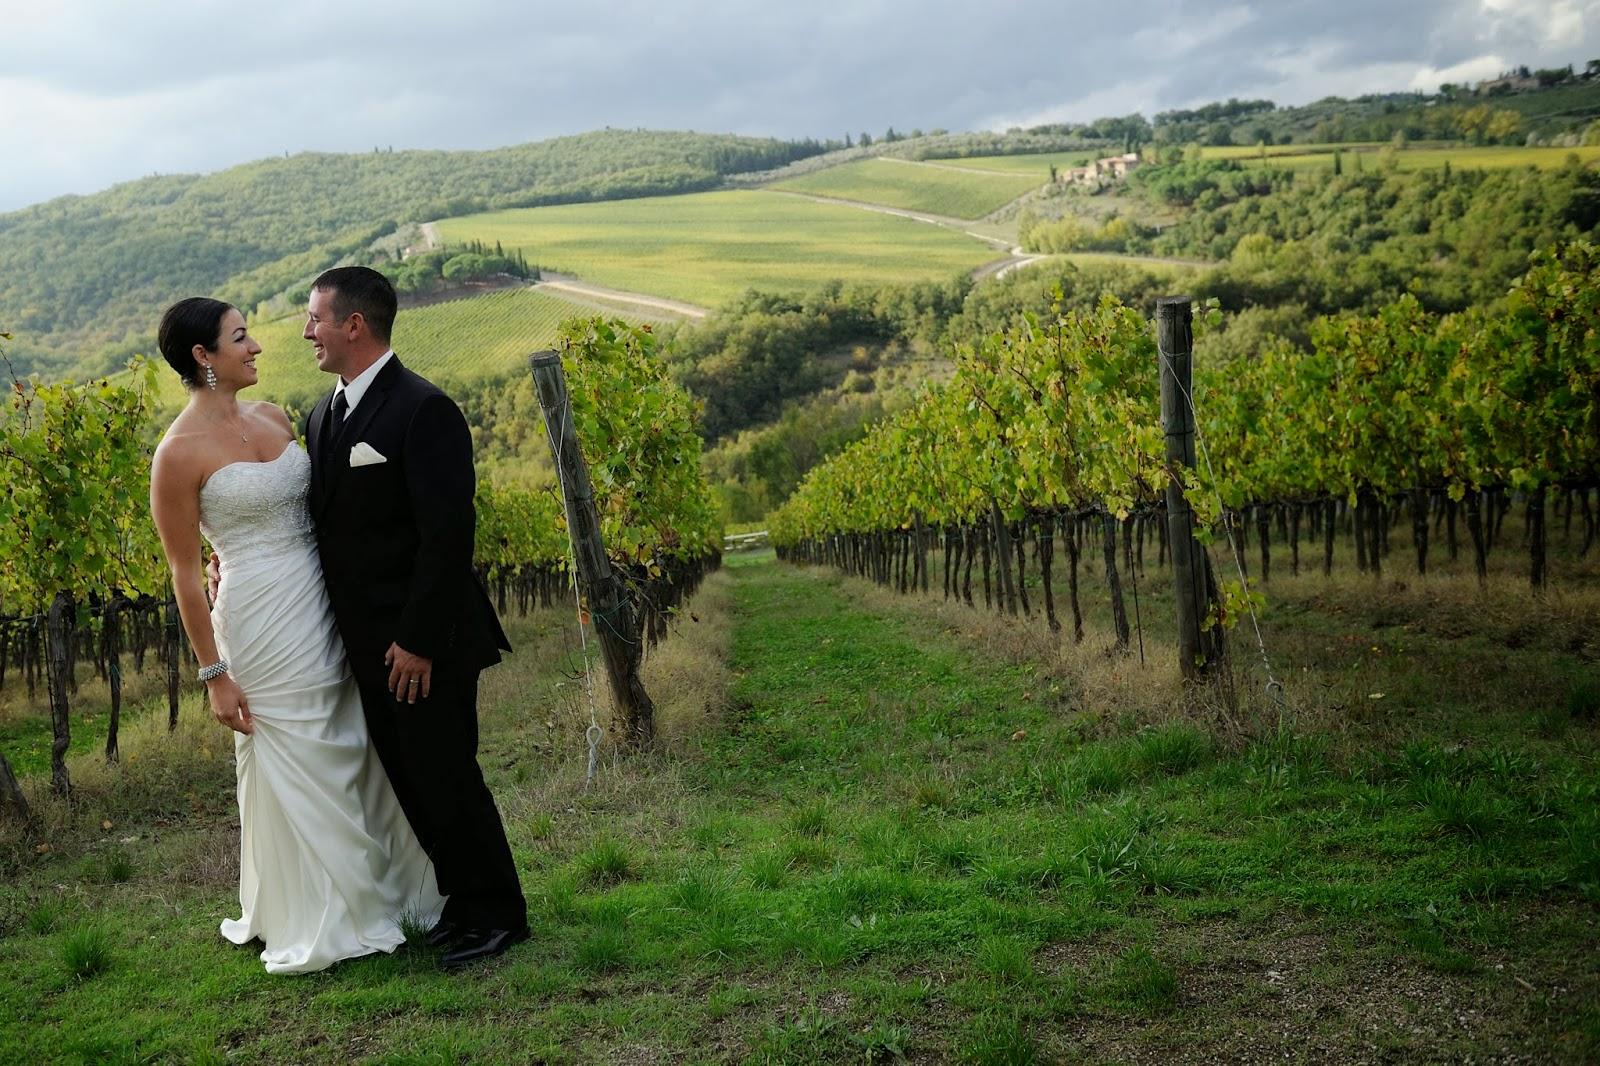 Italian wine blogger discussing Italian wines